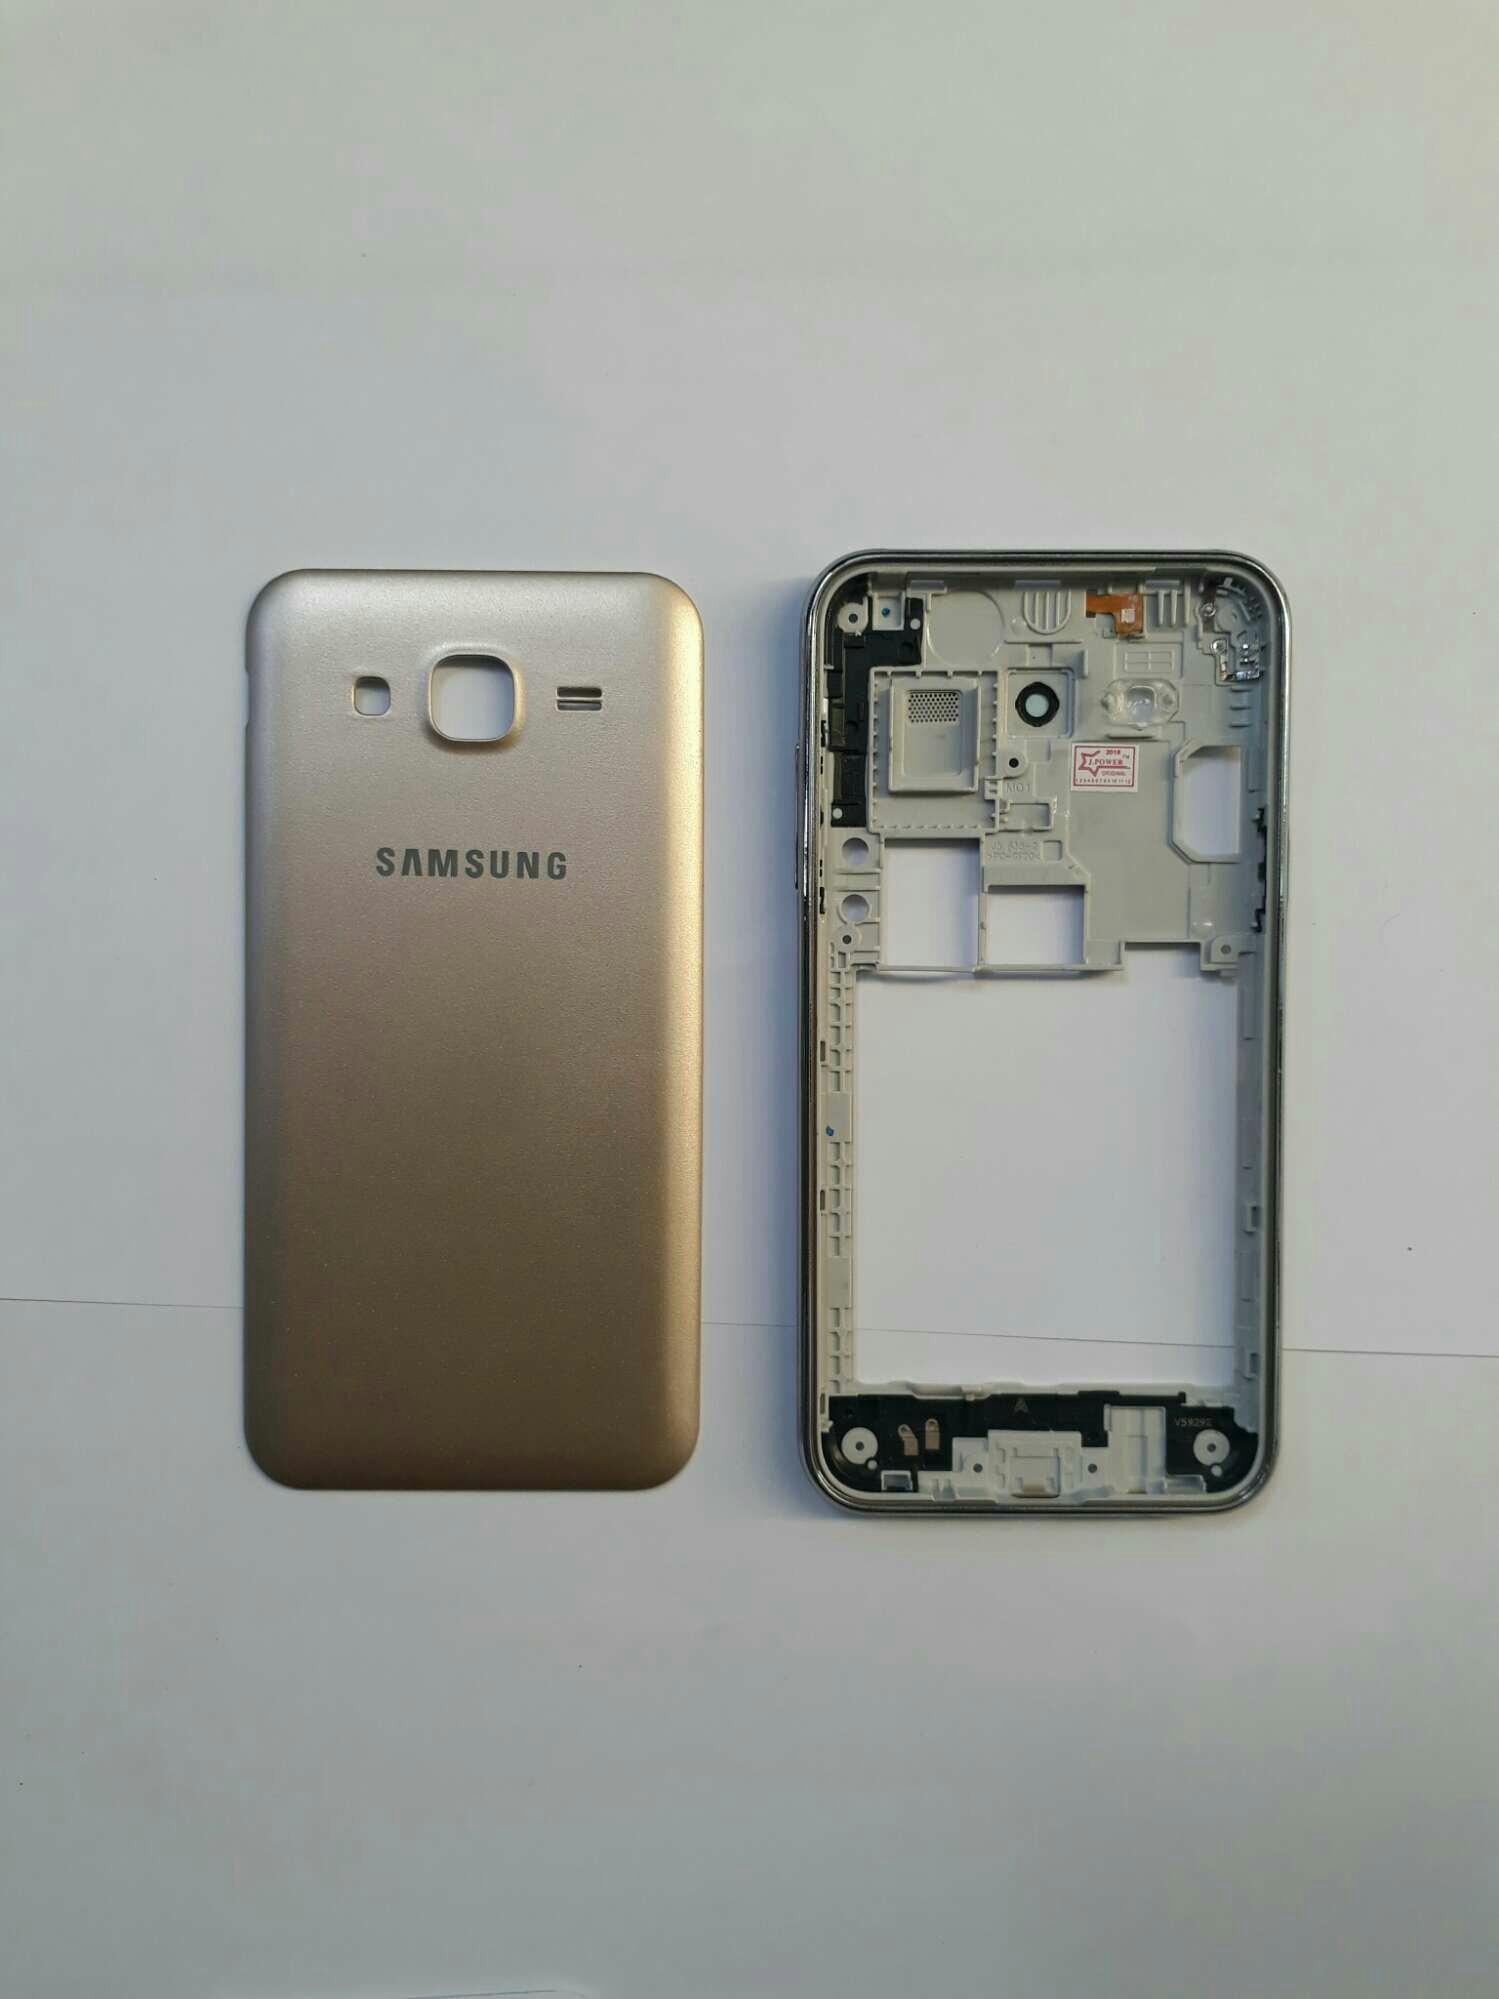 Suku Cadang Handphone Tablet Lcd Fullset Sony Xperia Z3 Original Putih Housing Kising Samsung J5 2015 Gold